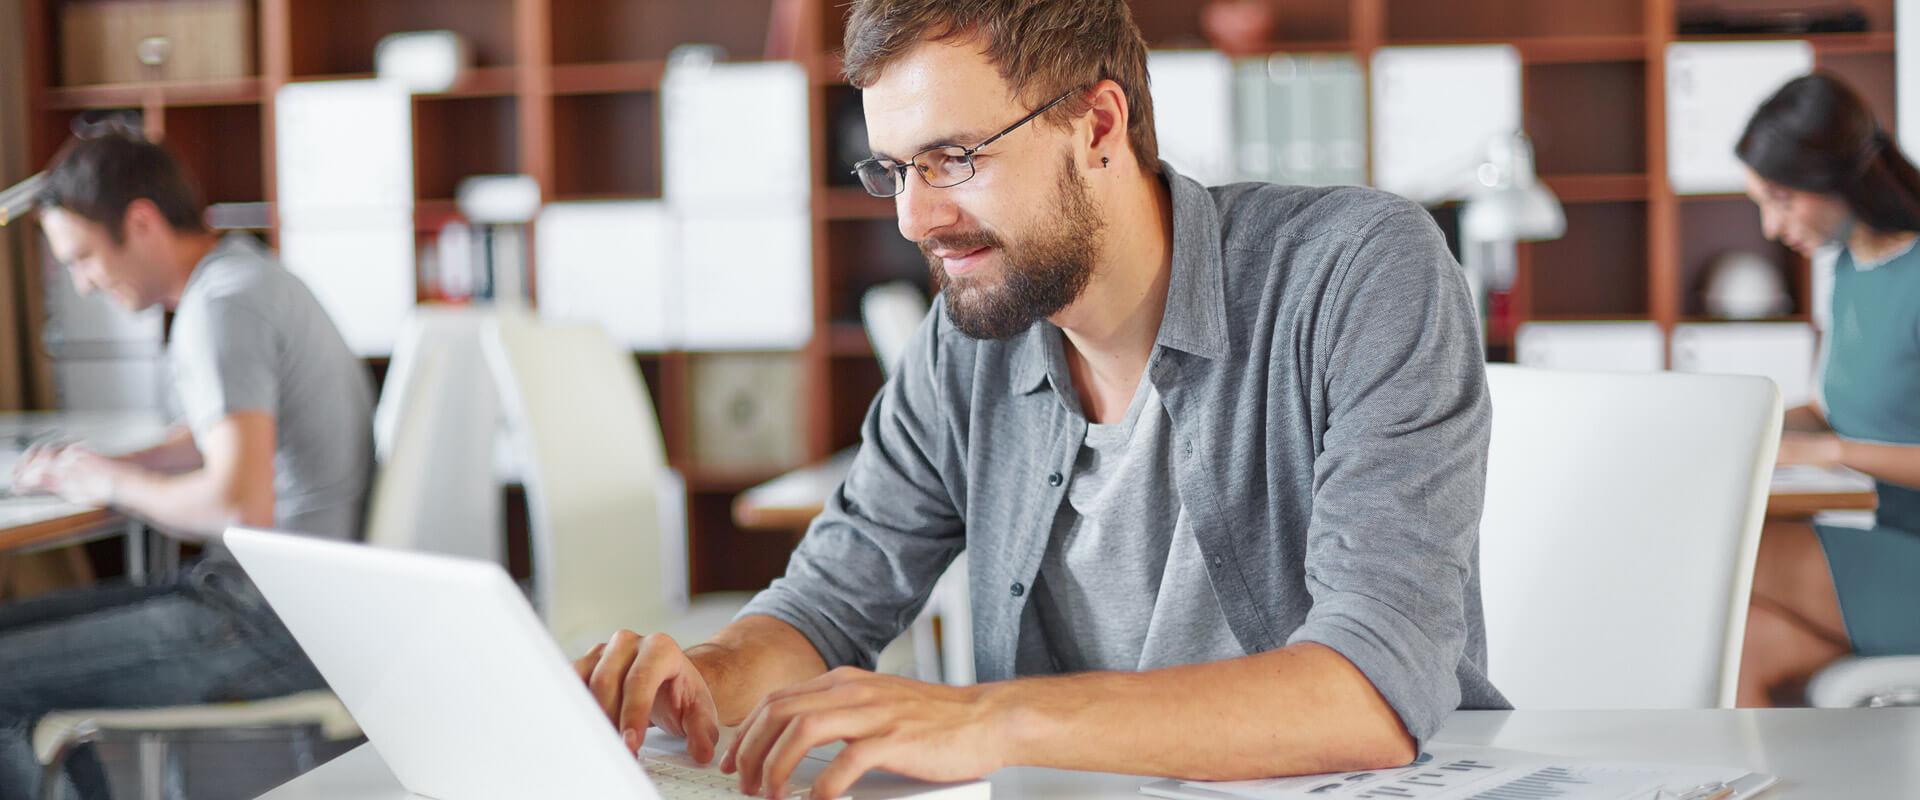 Pathway HR Solutions - Webinars